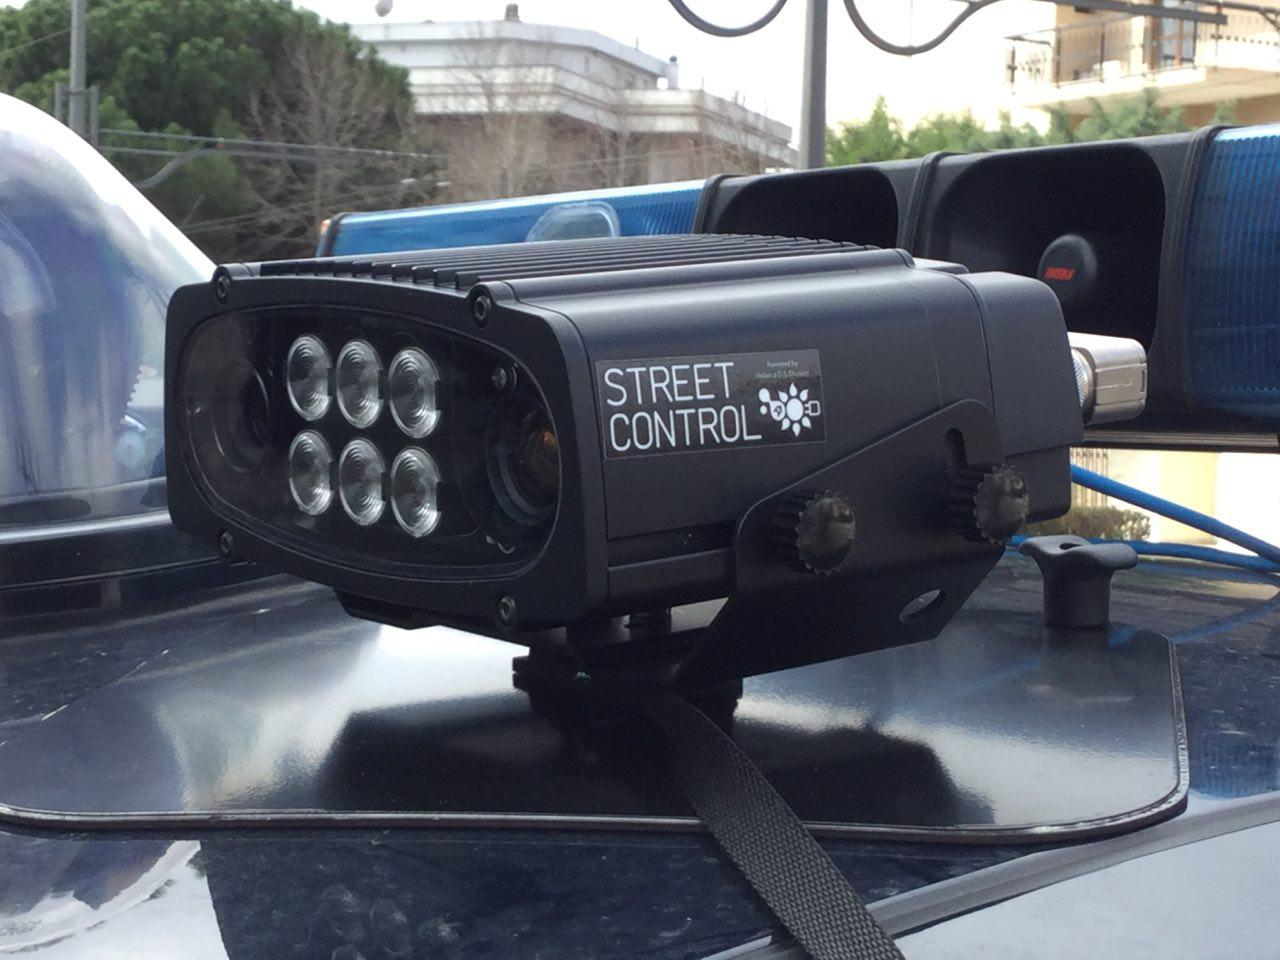 STREET CONTROL1